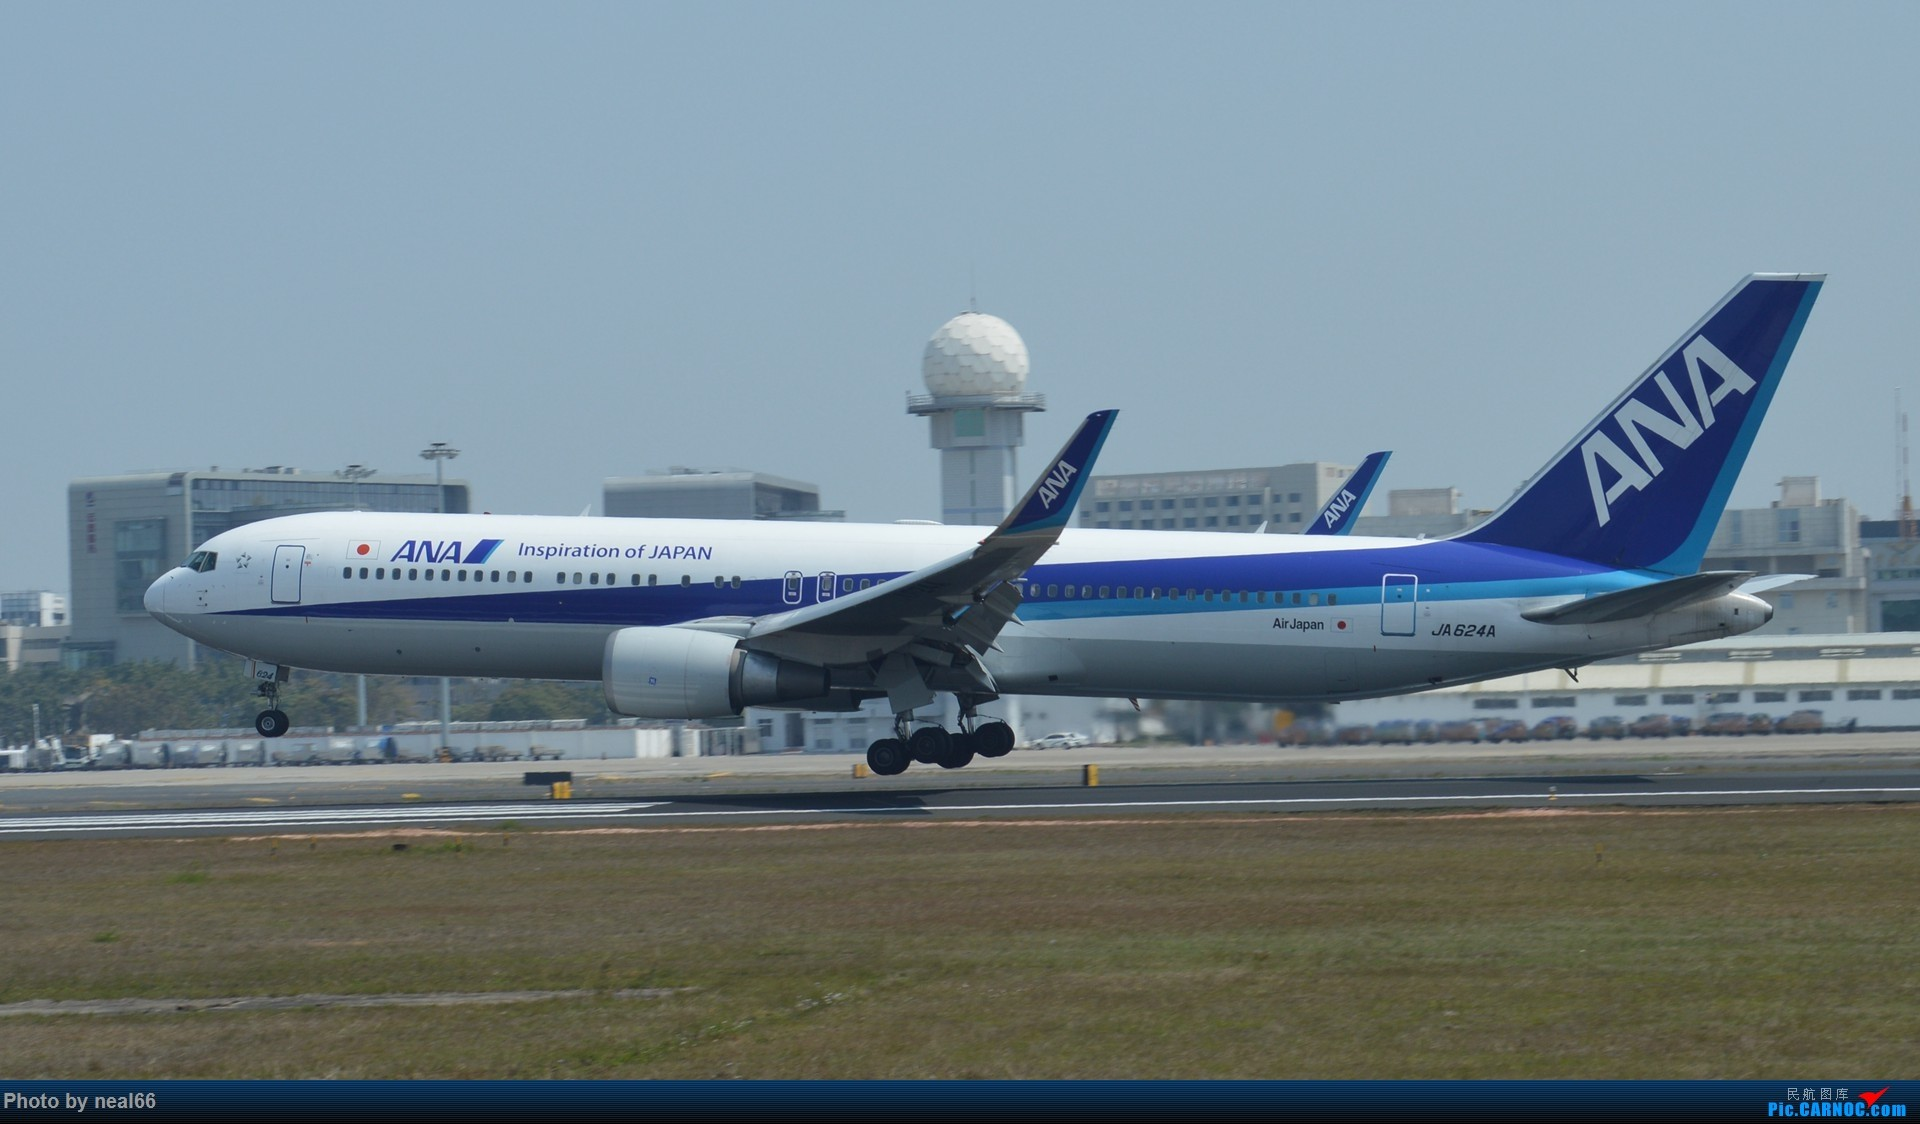 Re:[原创]厦门机场的较大飞机 767 JA624A 厦门机场